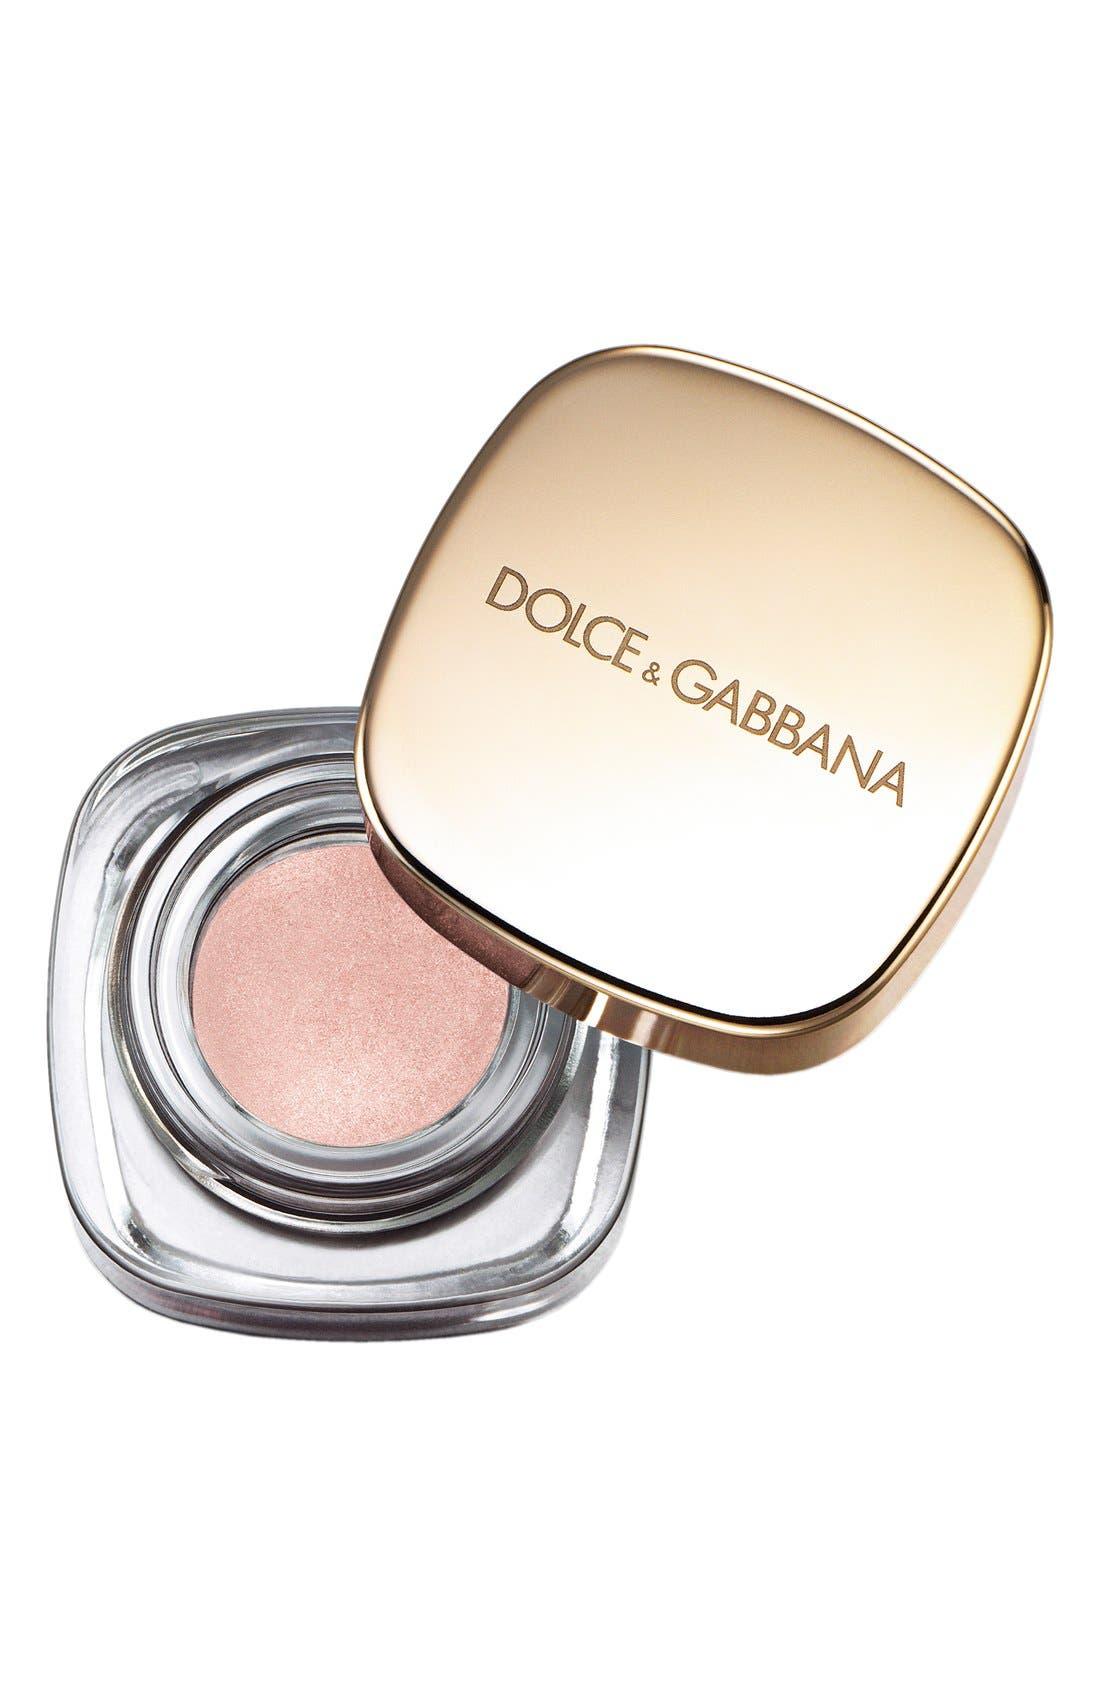 Dolce&Gabbana Beauty 'Perfect Mono' Pearl Cream Eye Color